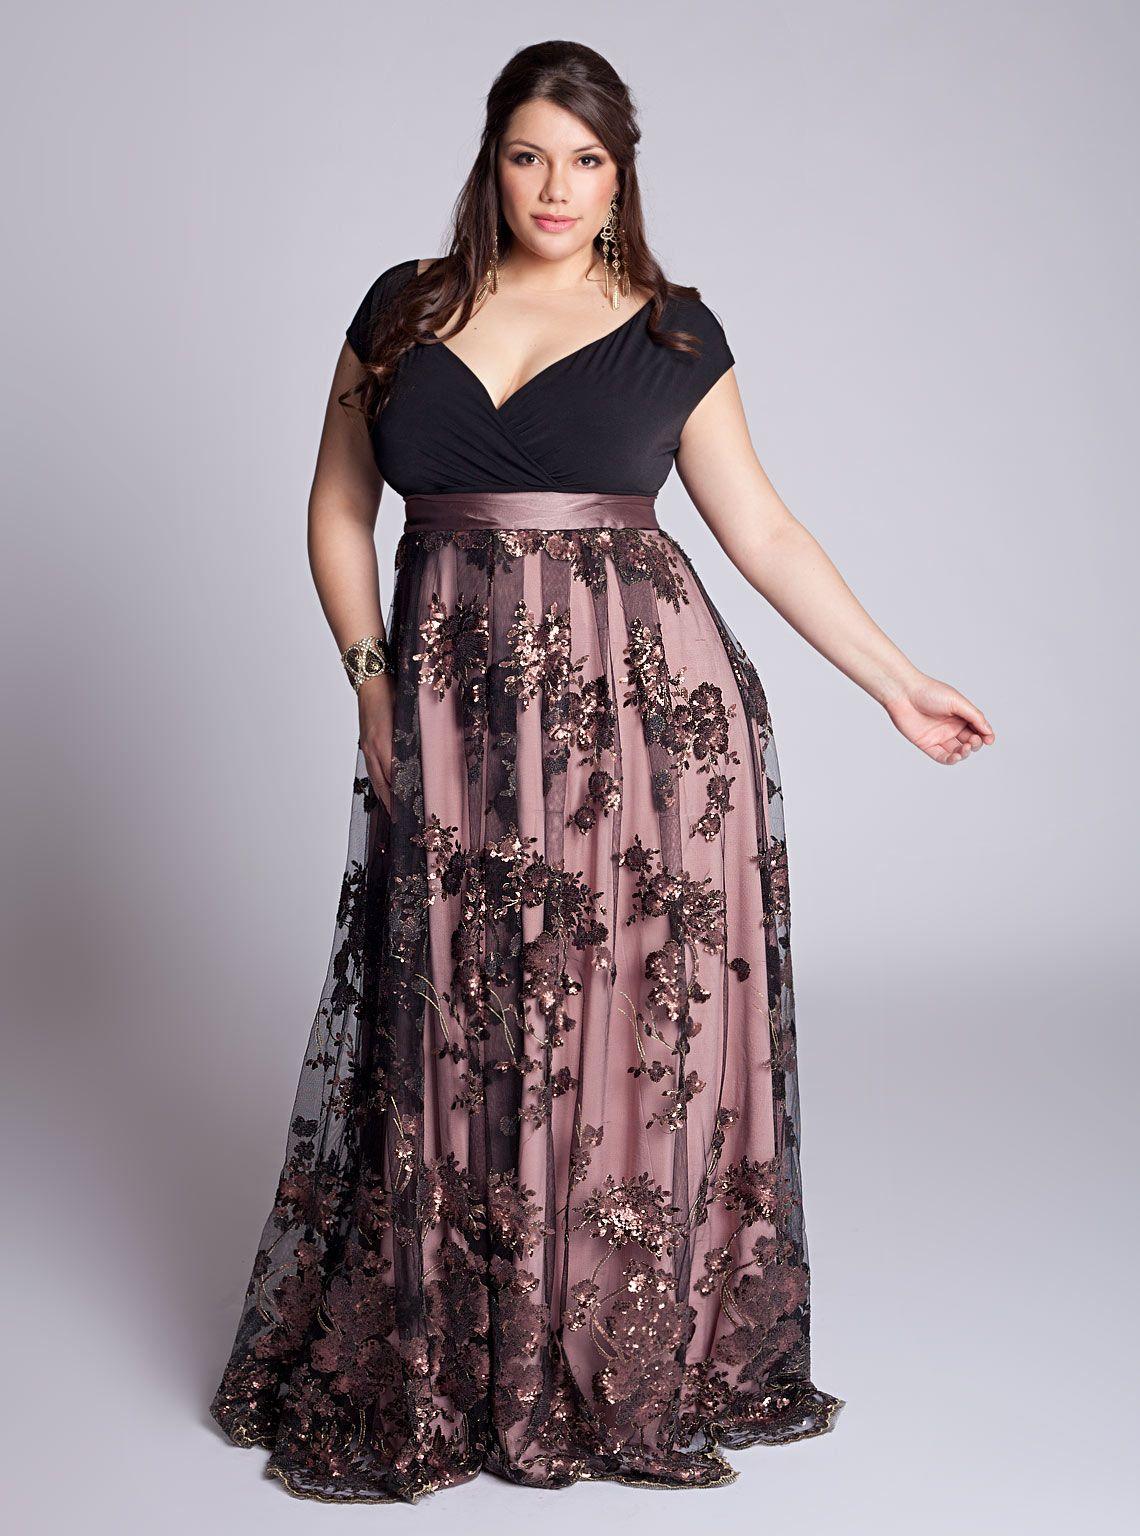 Igigi plus size naomi gown look at the gorgeous skirt on this igigi plus size naomi gown look at the gorgeous skirt on this dress ombrellifo Images